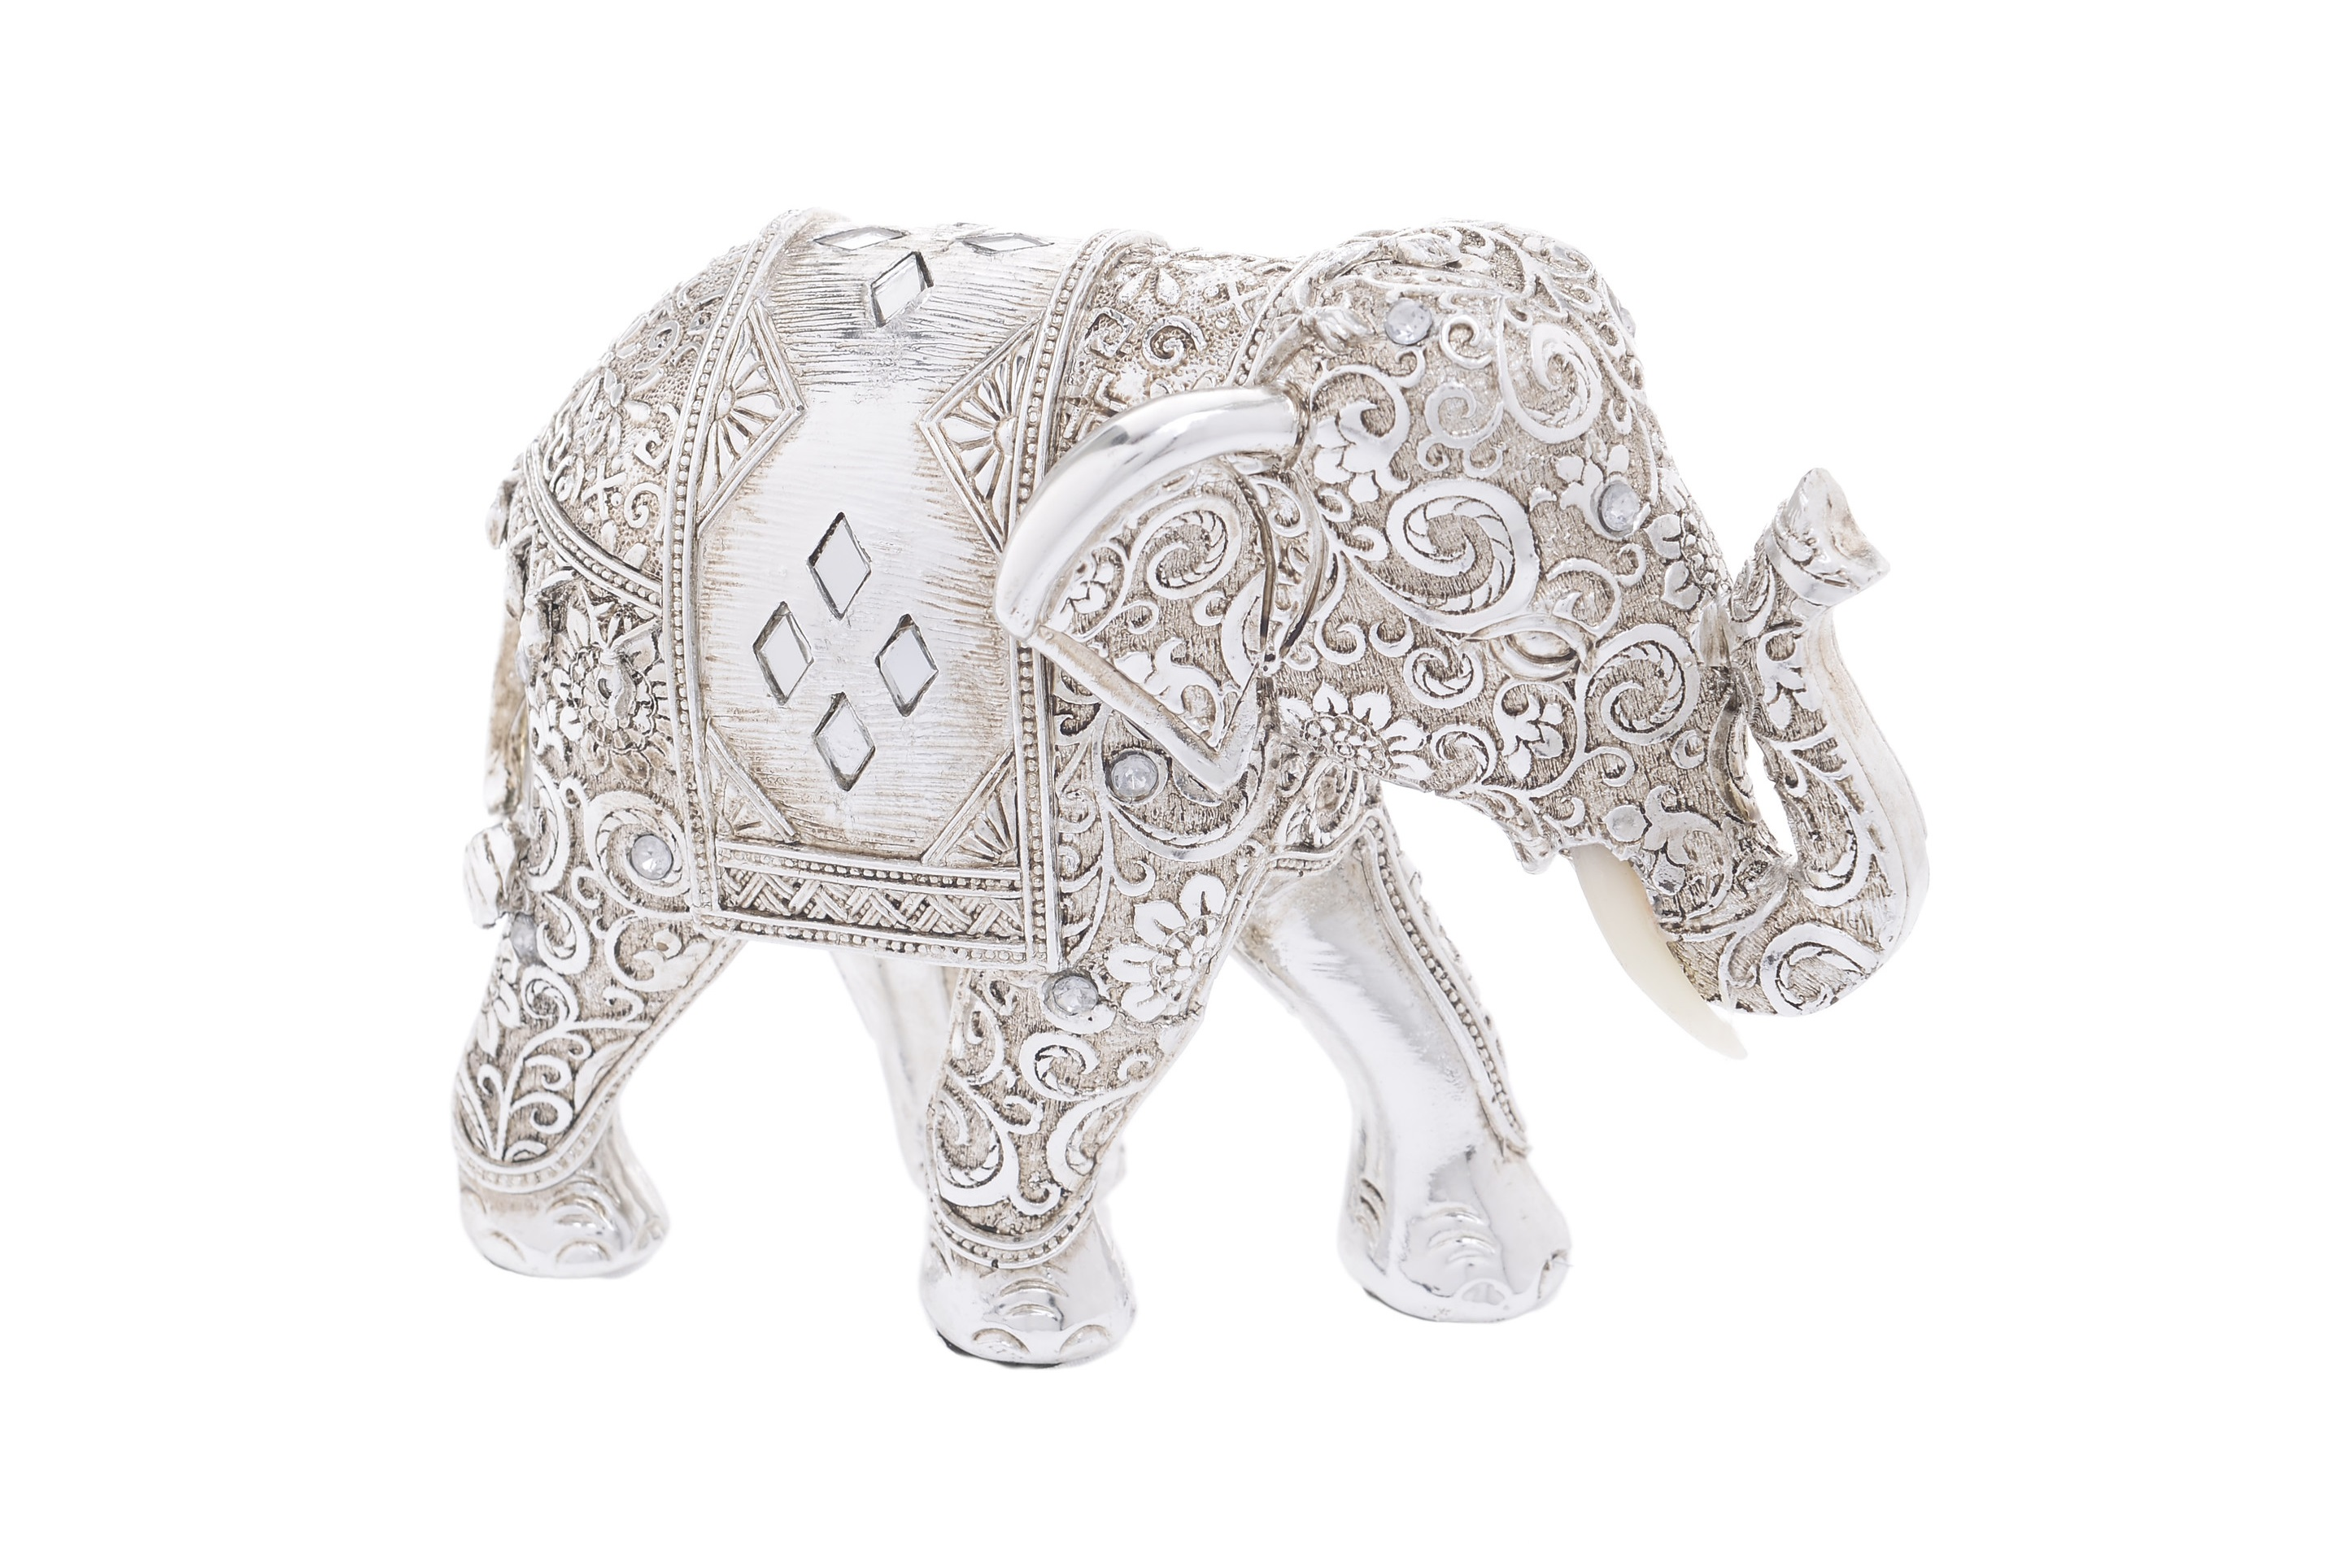 Статуэтка слон FendaraСтатуэтки<br>Материал: полистоун, стразы<br><br>Material: Пластик<br>Width см: 14<br>Depth см: 6<br>Height см: 10.5